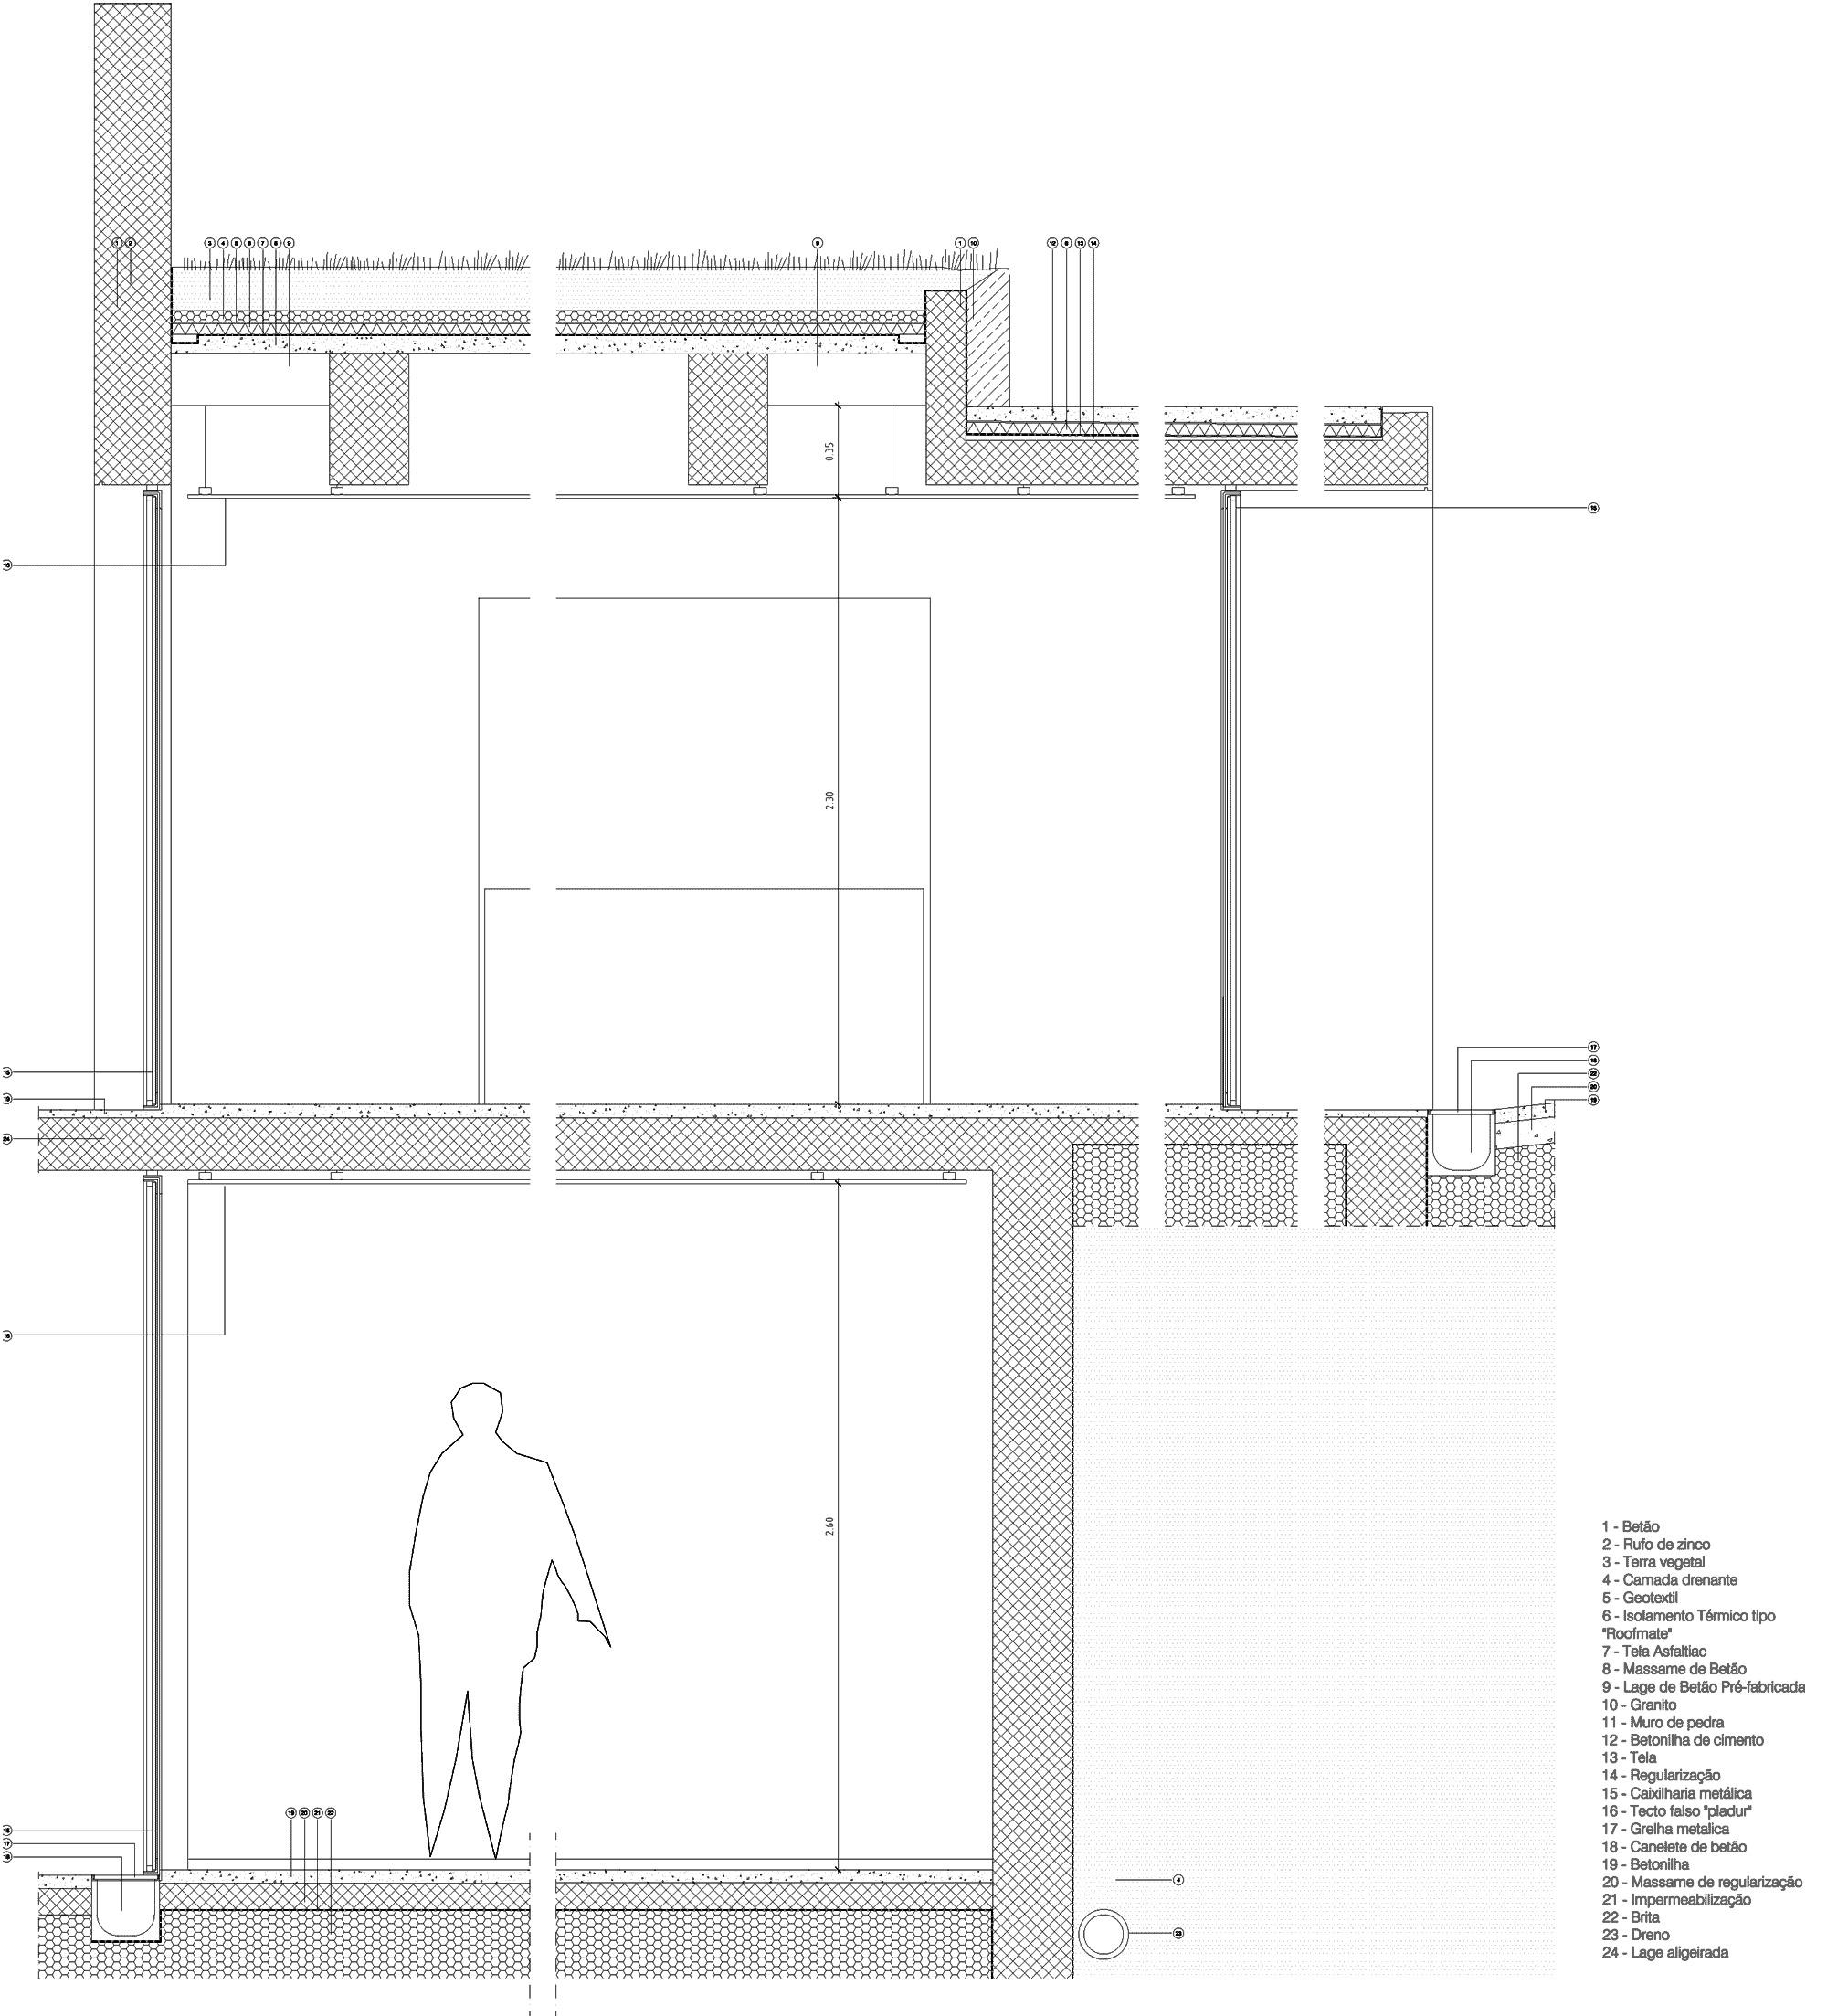 Galer a de en detalle cortes constructivos techos verdes 6 - Detalle constructivo techo ...